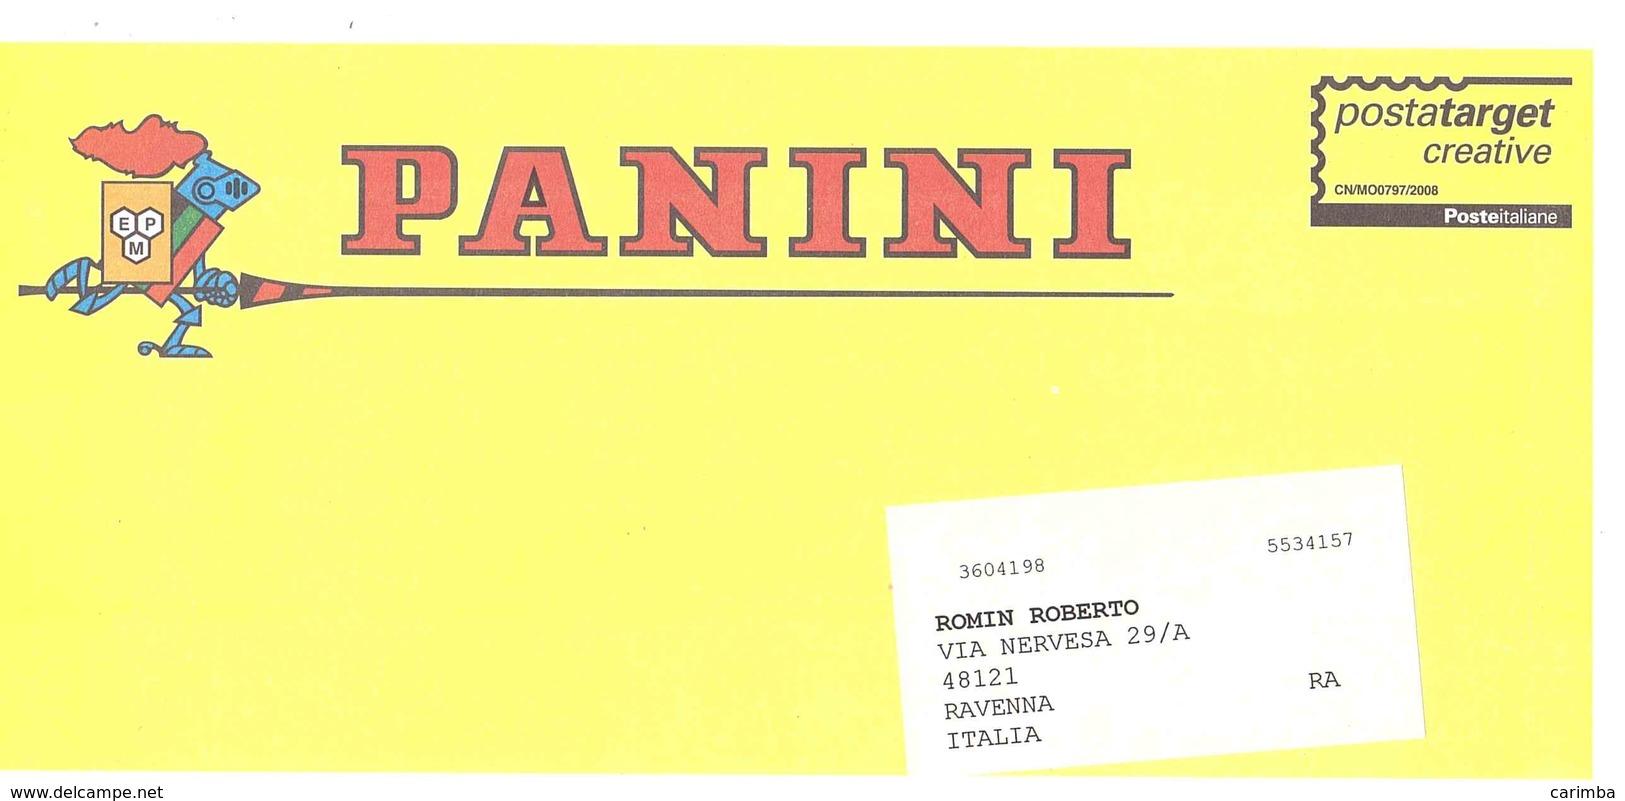 PANINI - Affrancature Meccaniche Rosse (EMA)